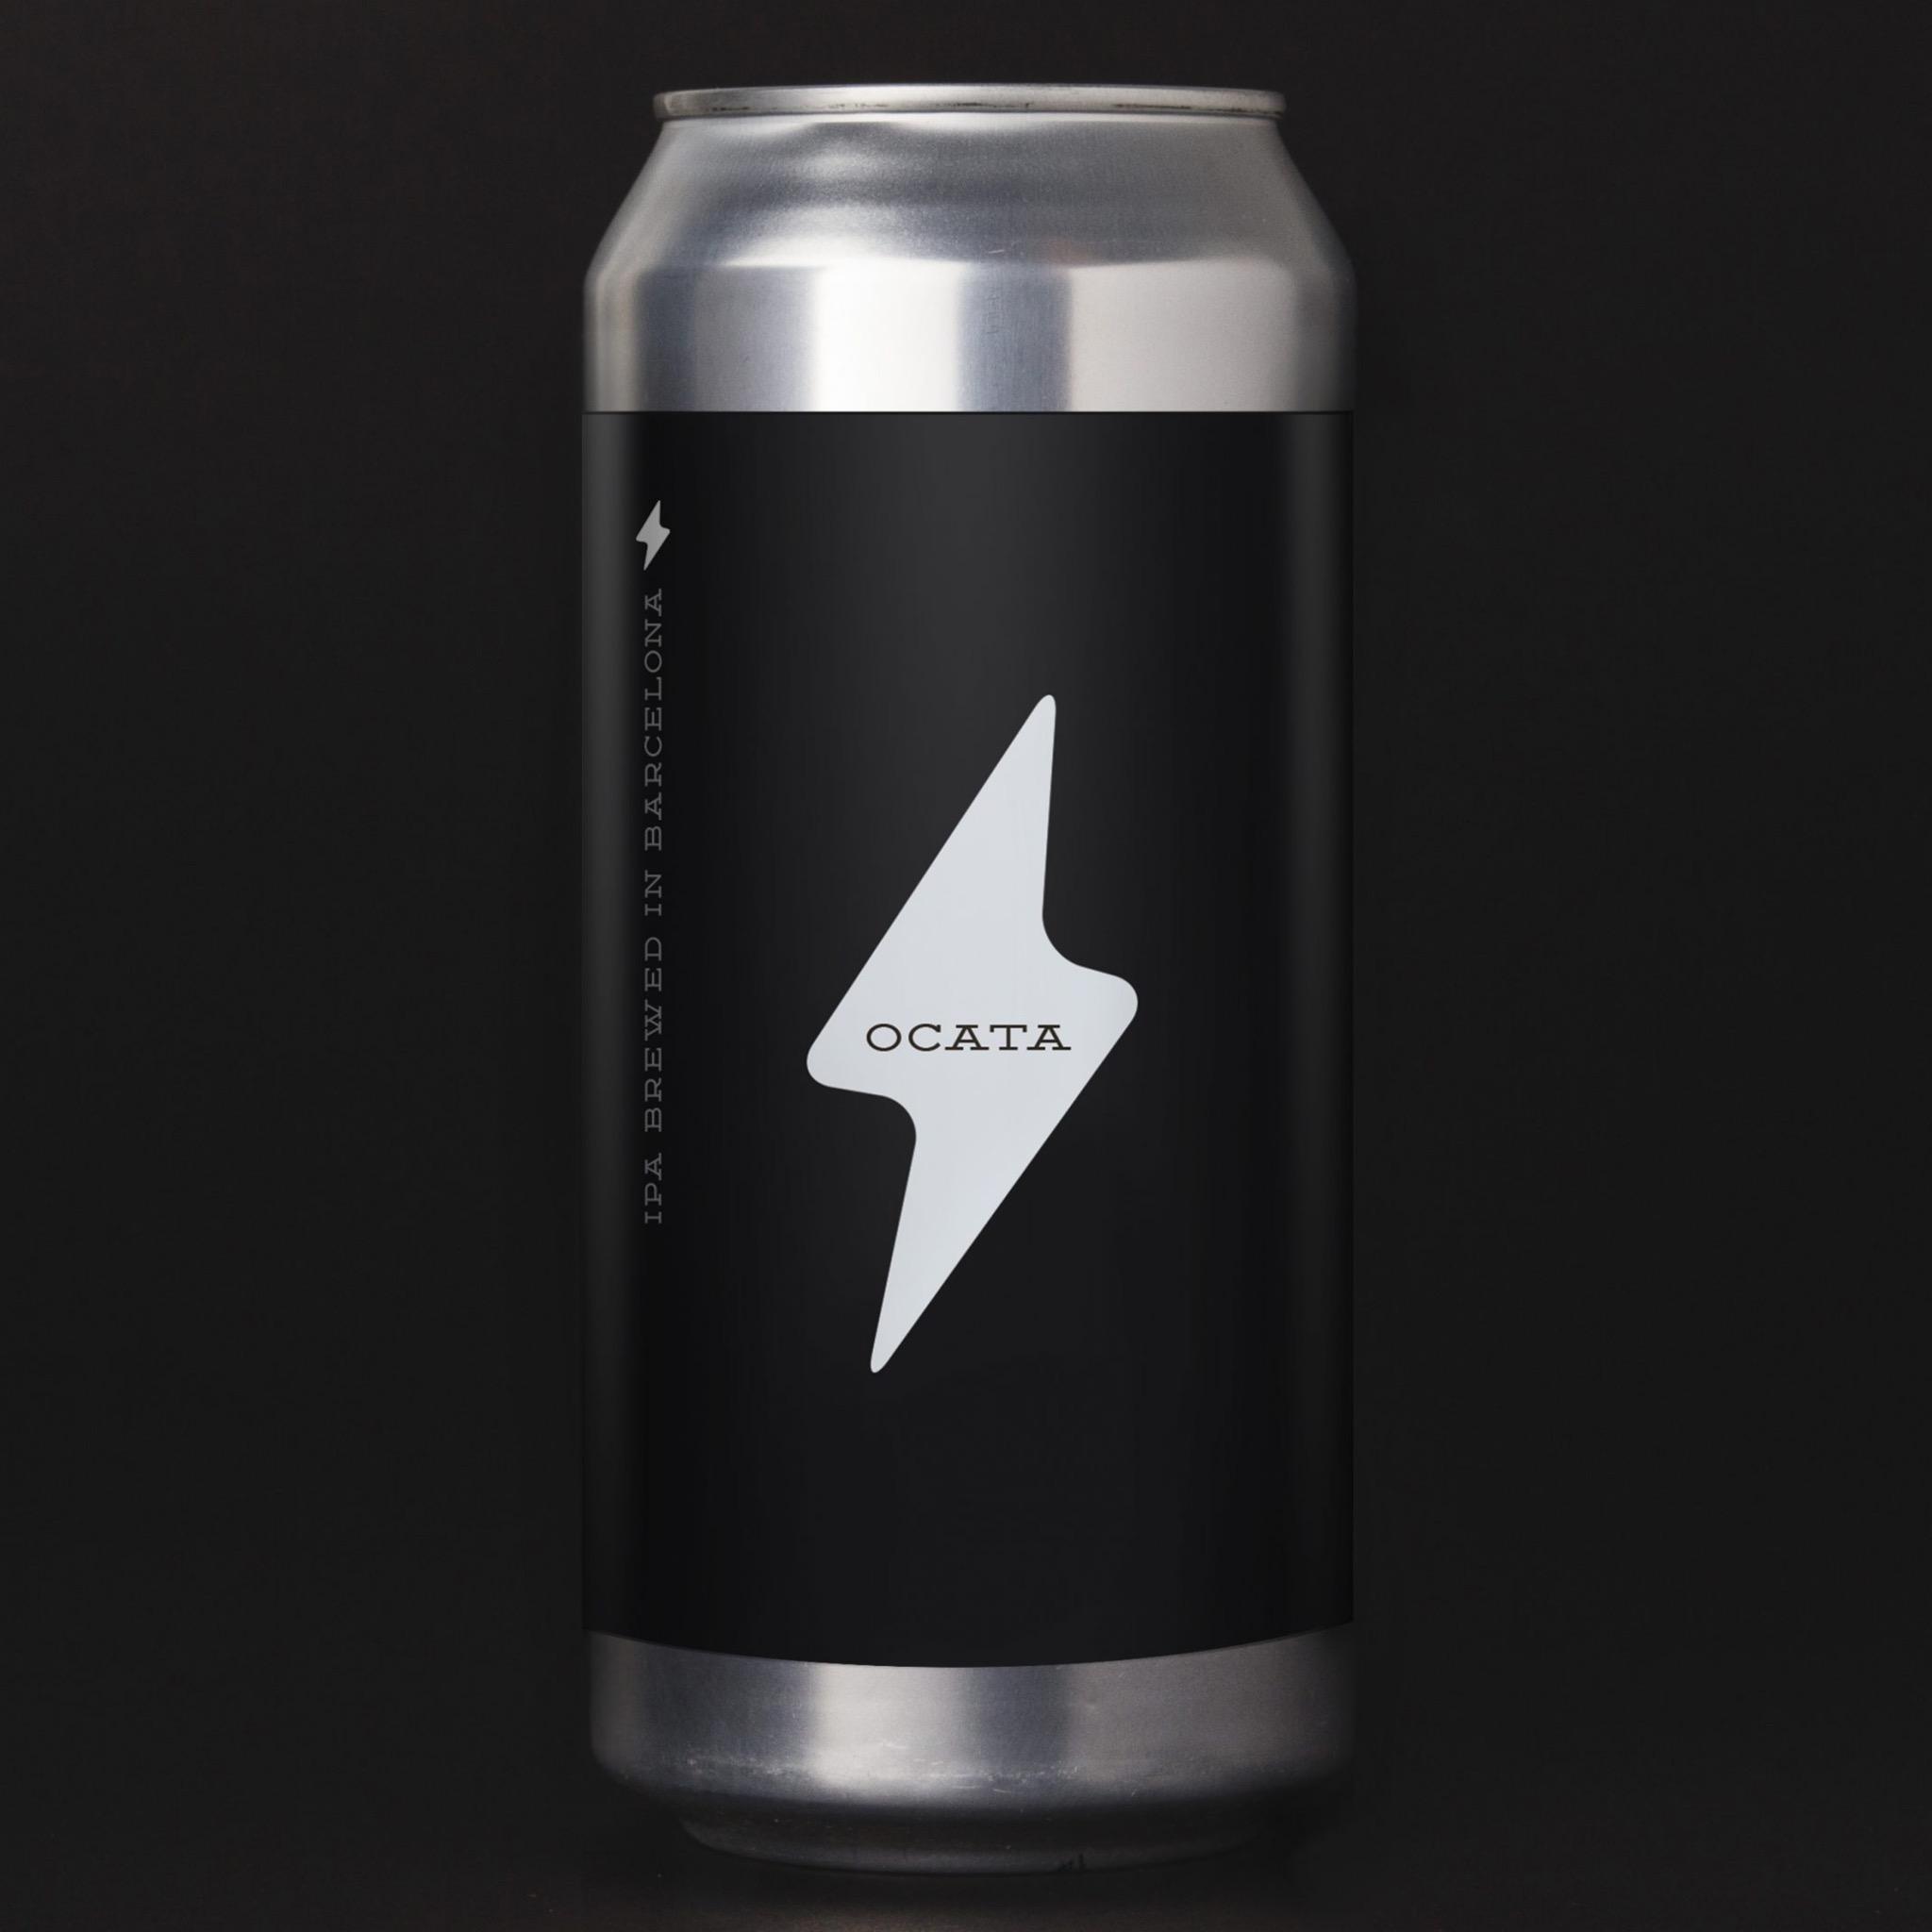 Ocata - Session IPA 5.4% 440m Garage Beer Co